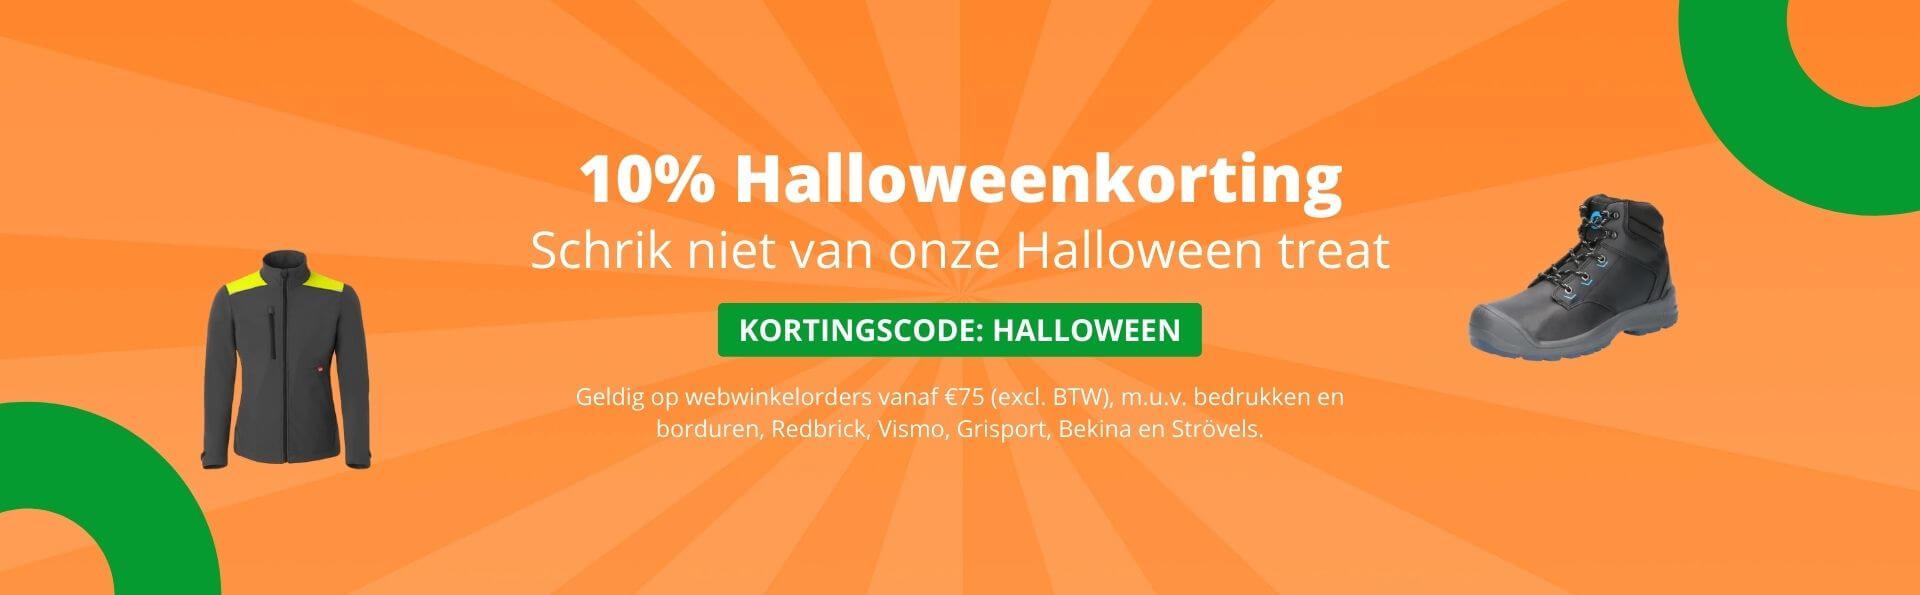 20201030 - Halloween